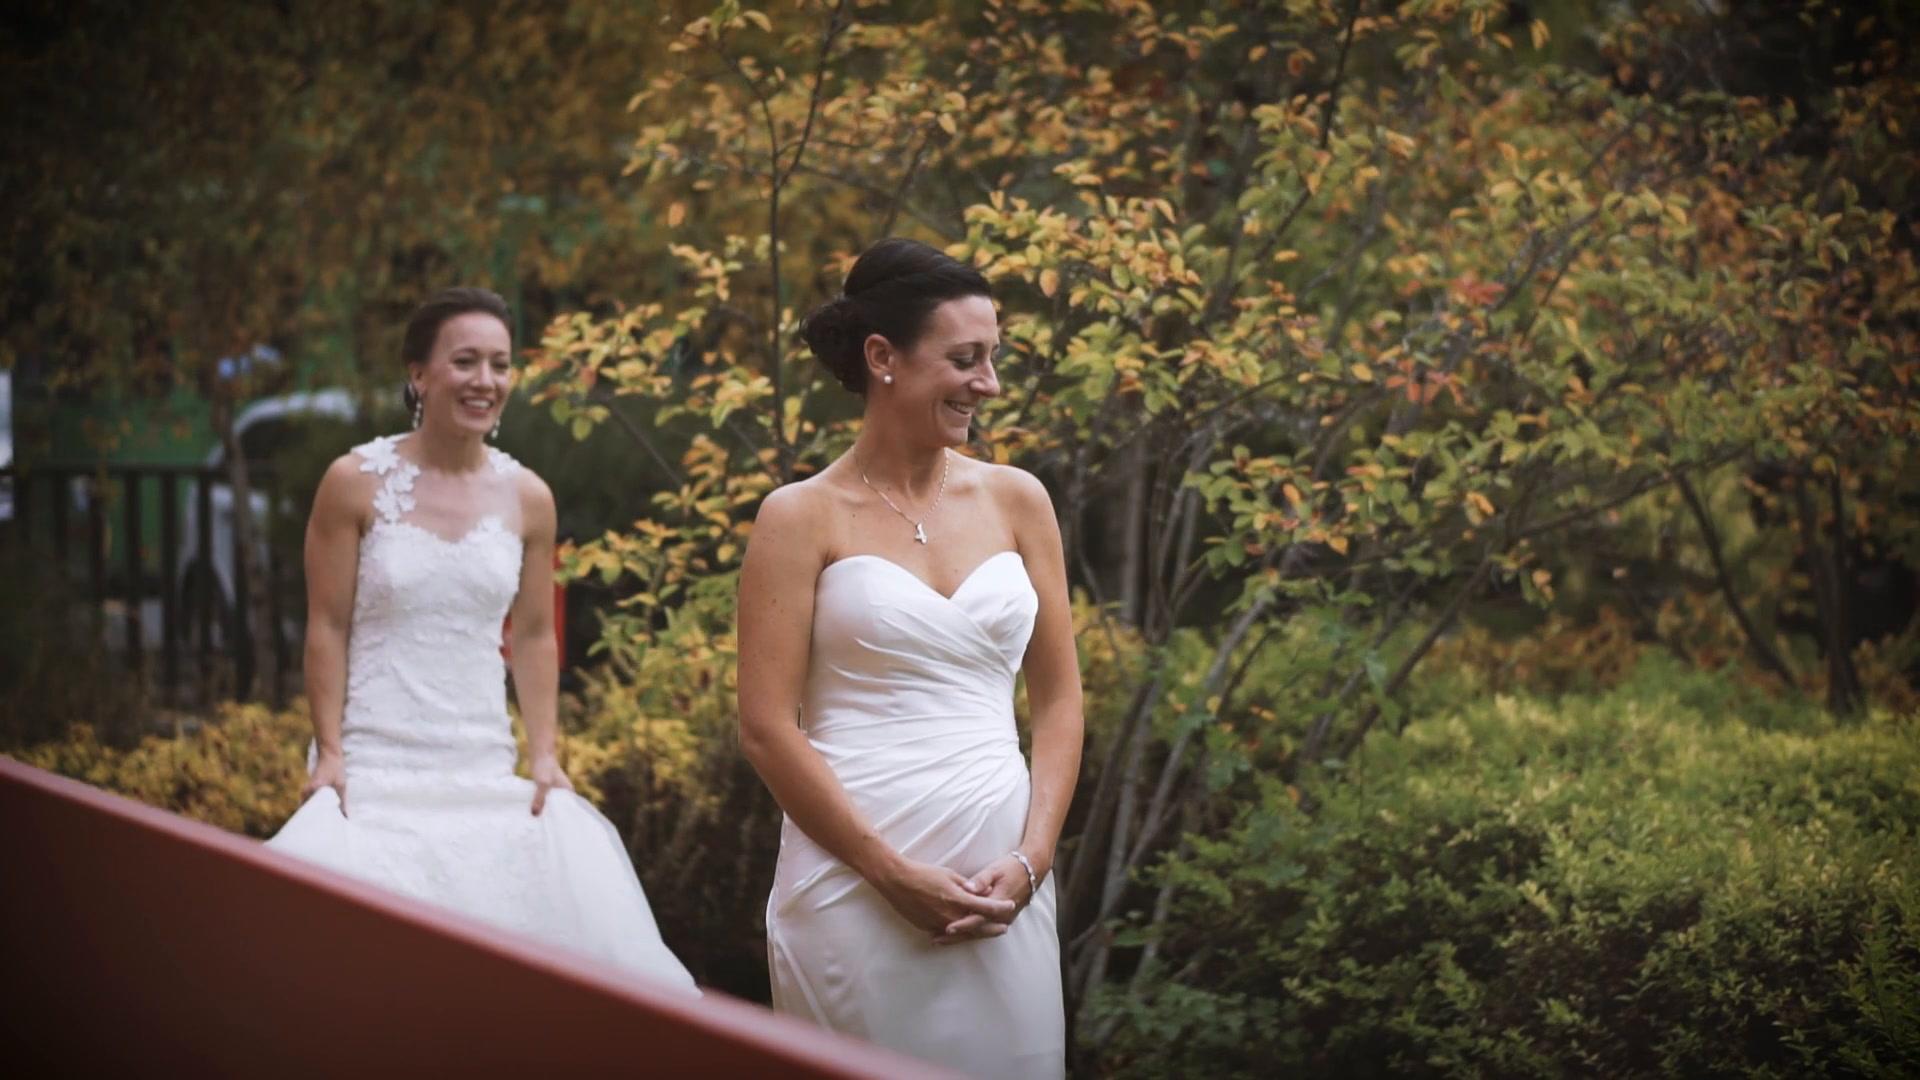 Alison + Diana | Saugatuck, Michigan | Felt Mansion